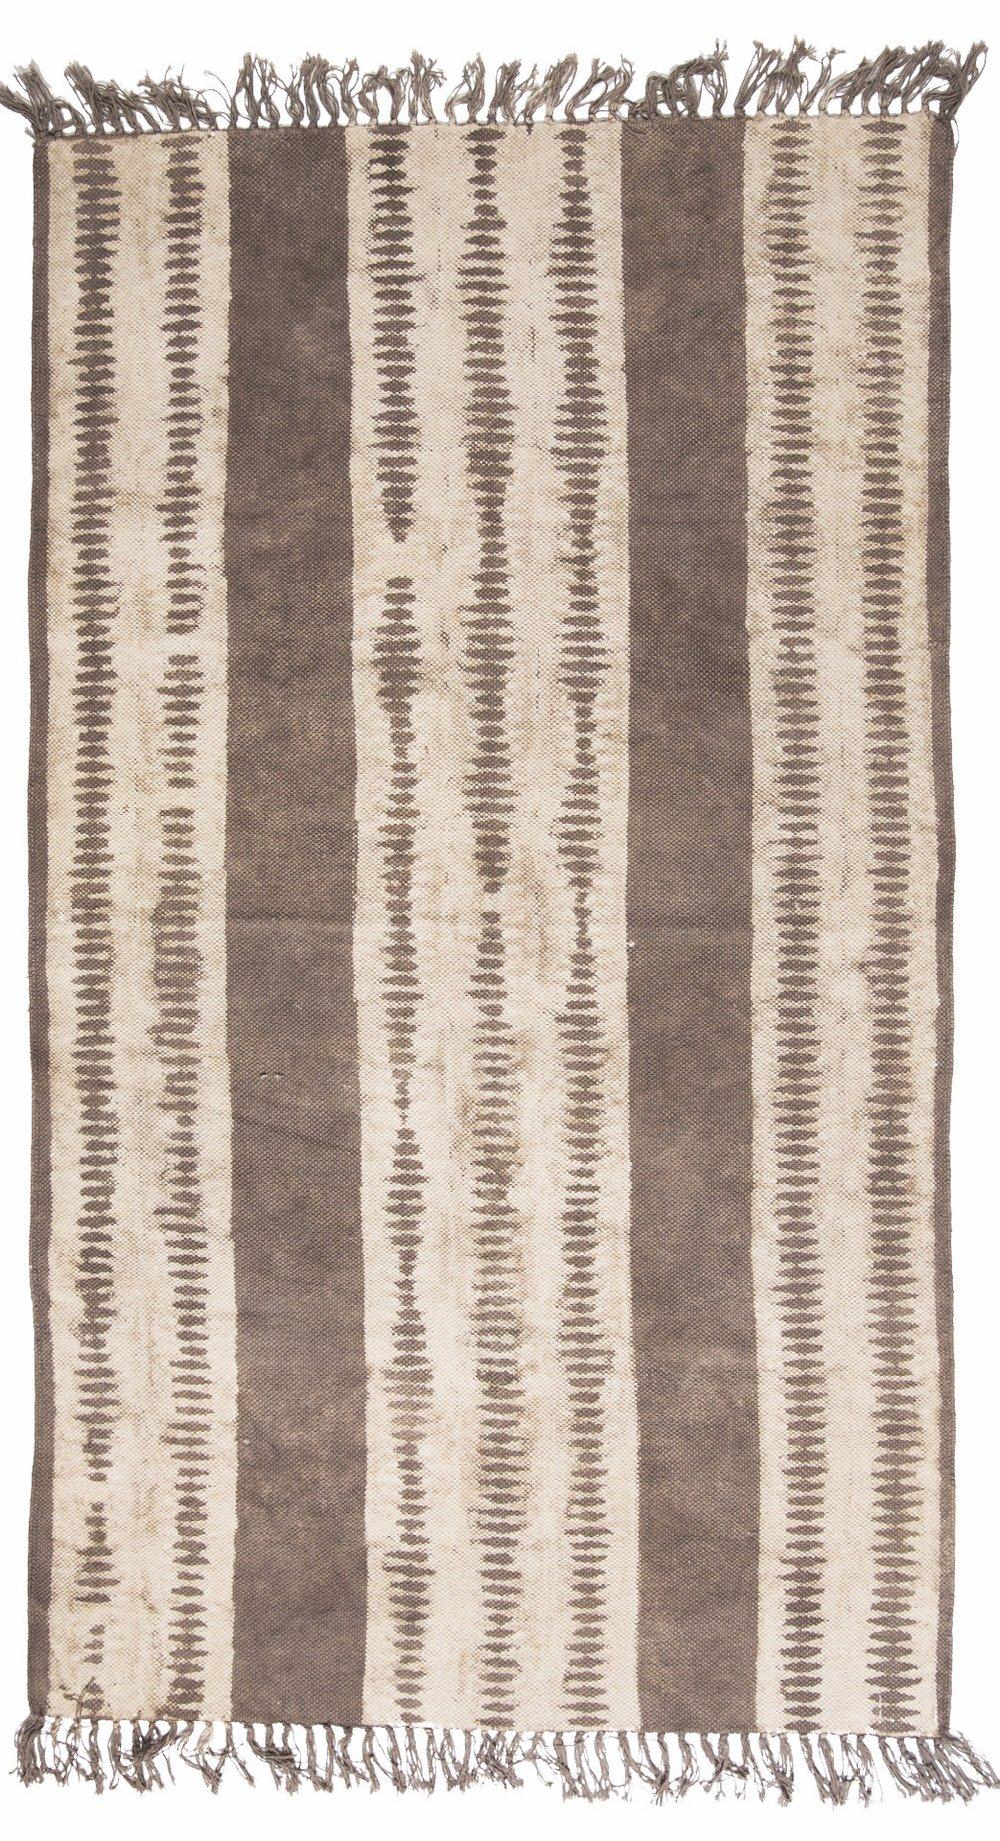 Ikat Block Printed Cotton Rug